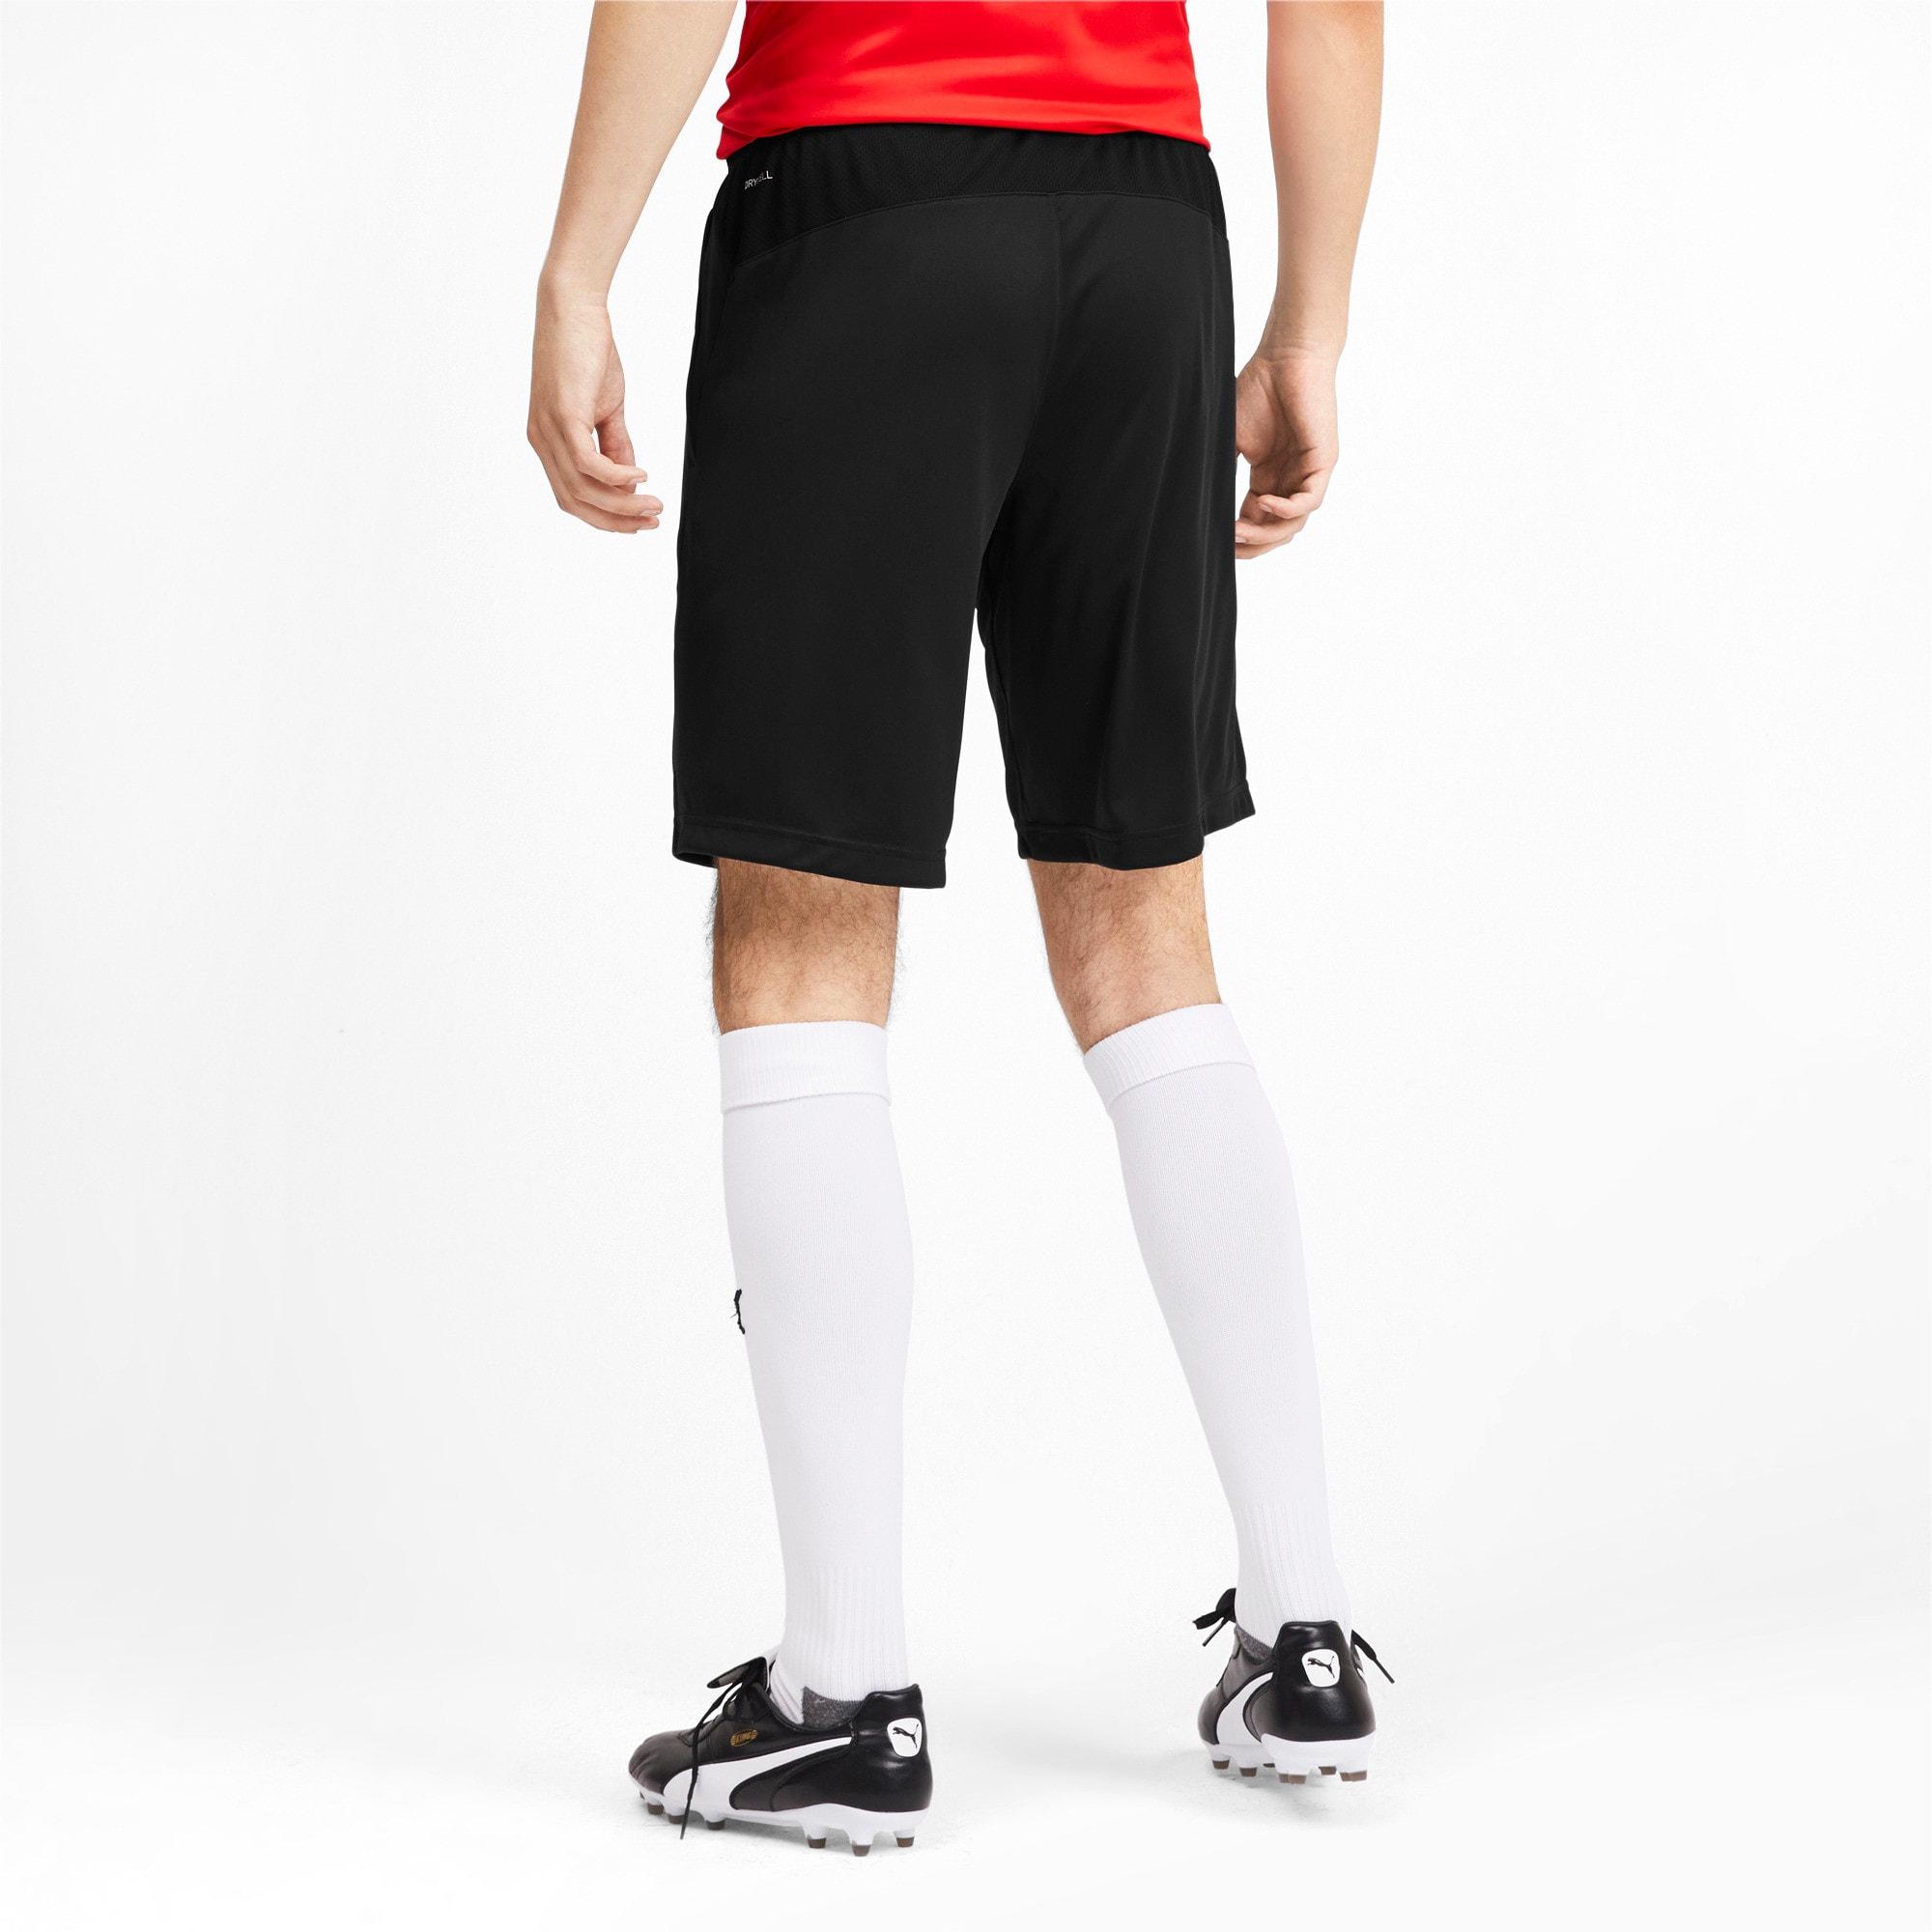 Thumbnail 2 of AC Milan Men's Training Shorts, Puma Black, medium